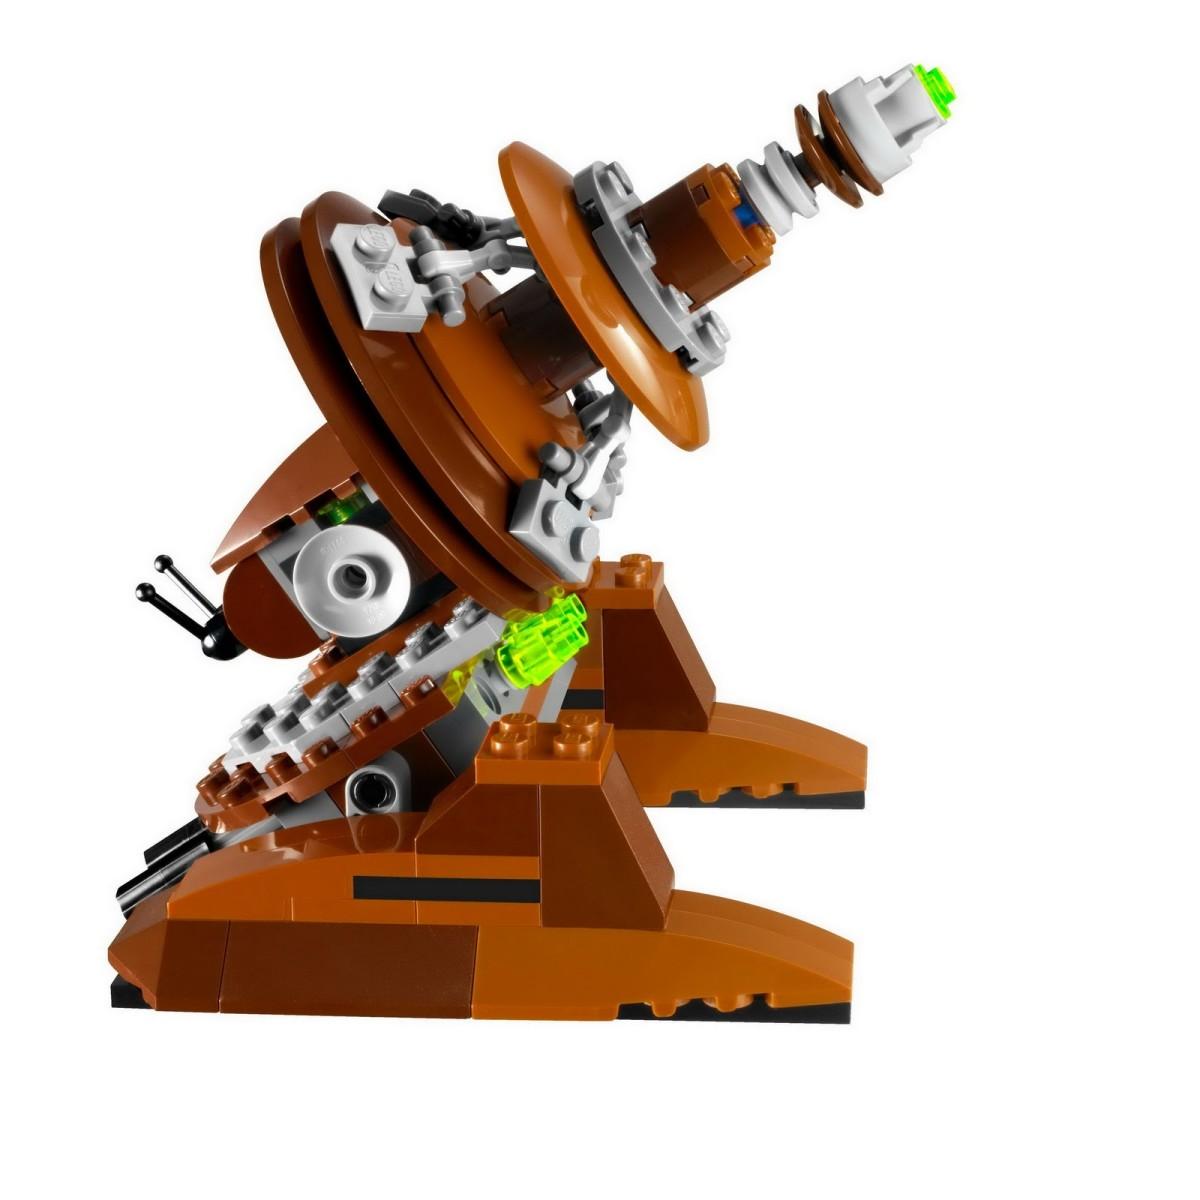 LEGO Star Wars Geonosian Cannon 9491 Assembled